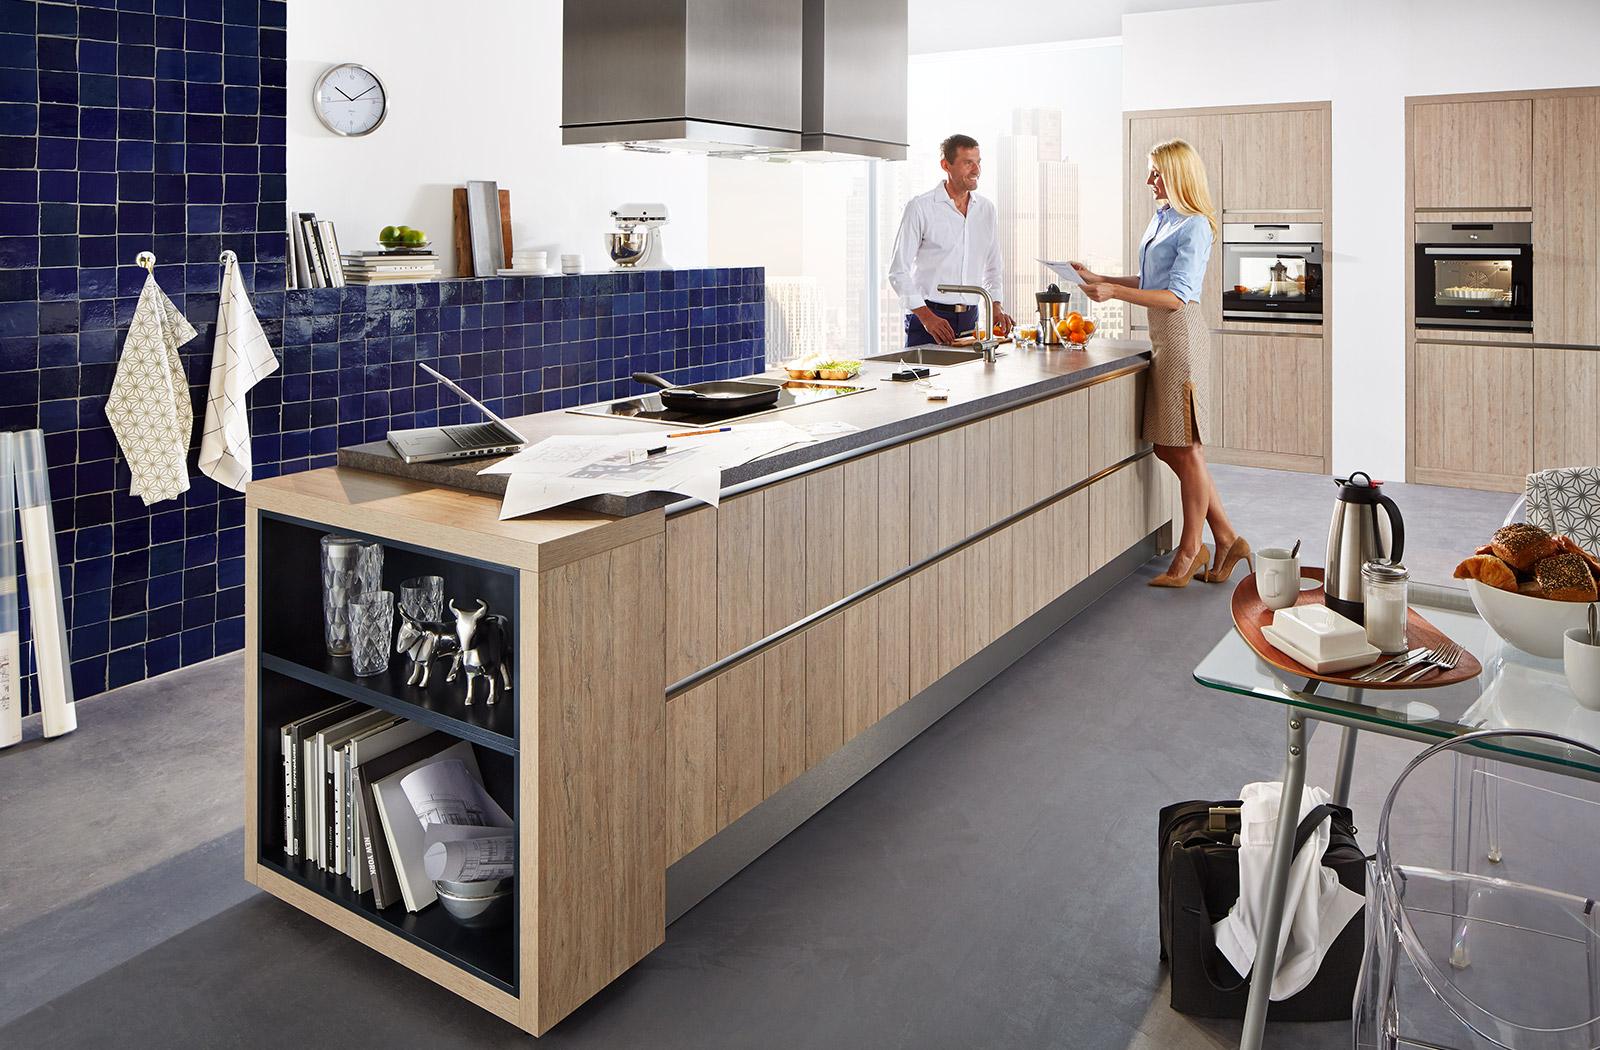 Meble kuchenne Montana - oferta SAS Wnętrza i Kuchnie - Meble Kuchenne i Projektowanie wnętrz.